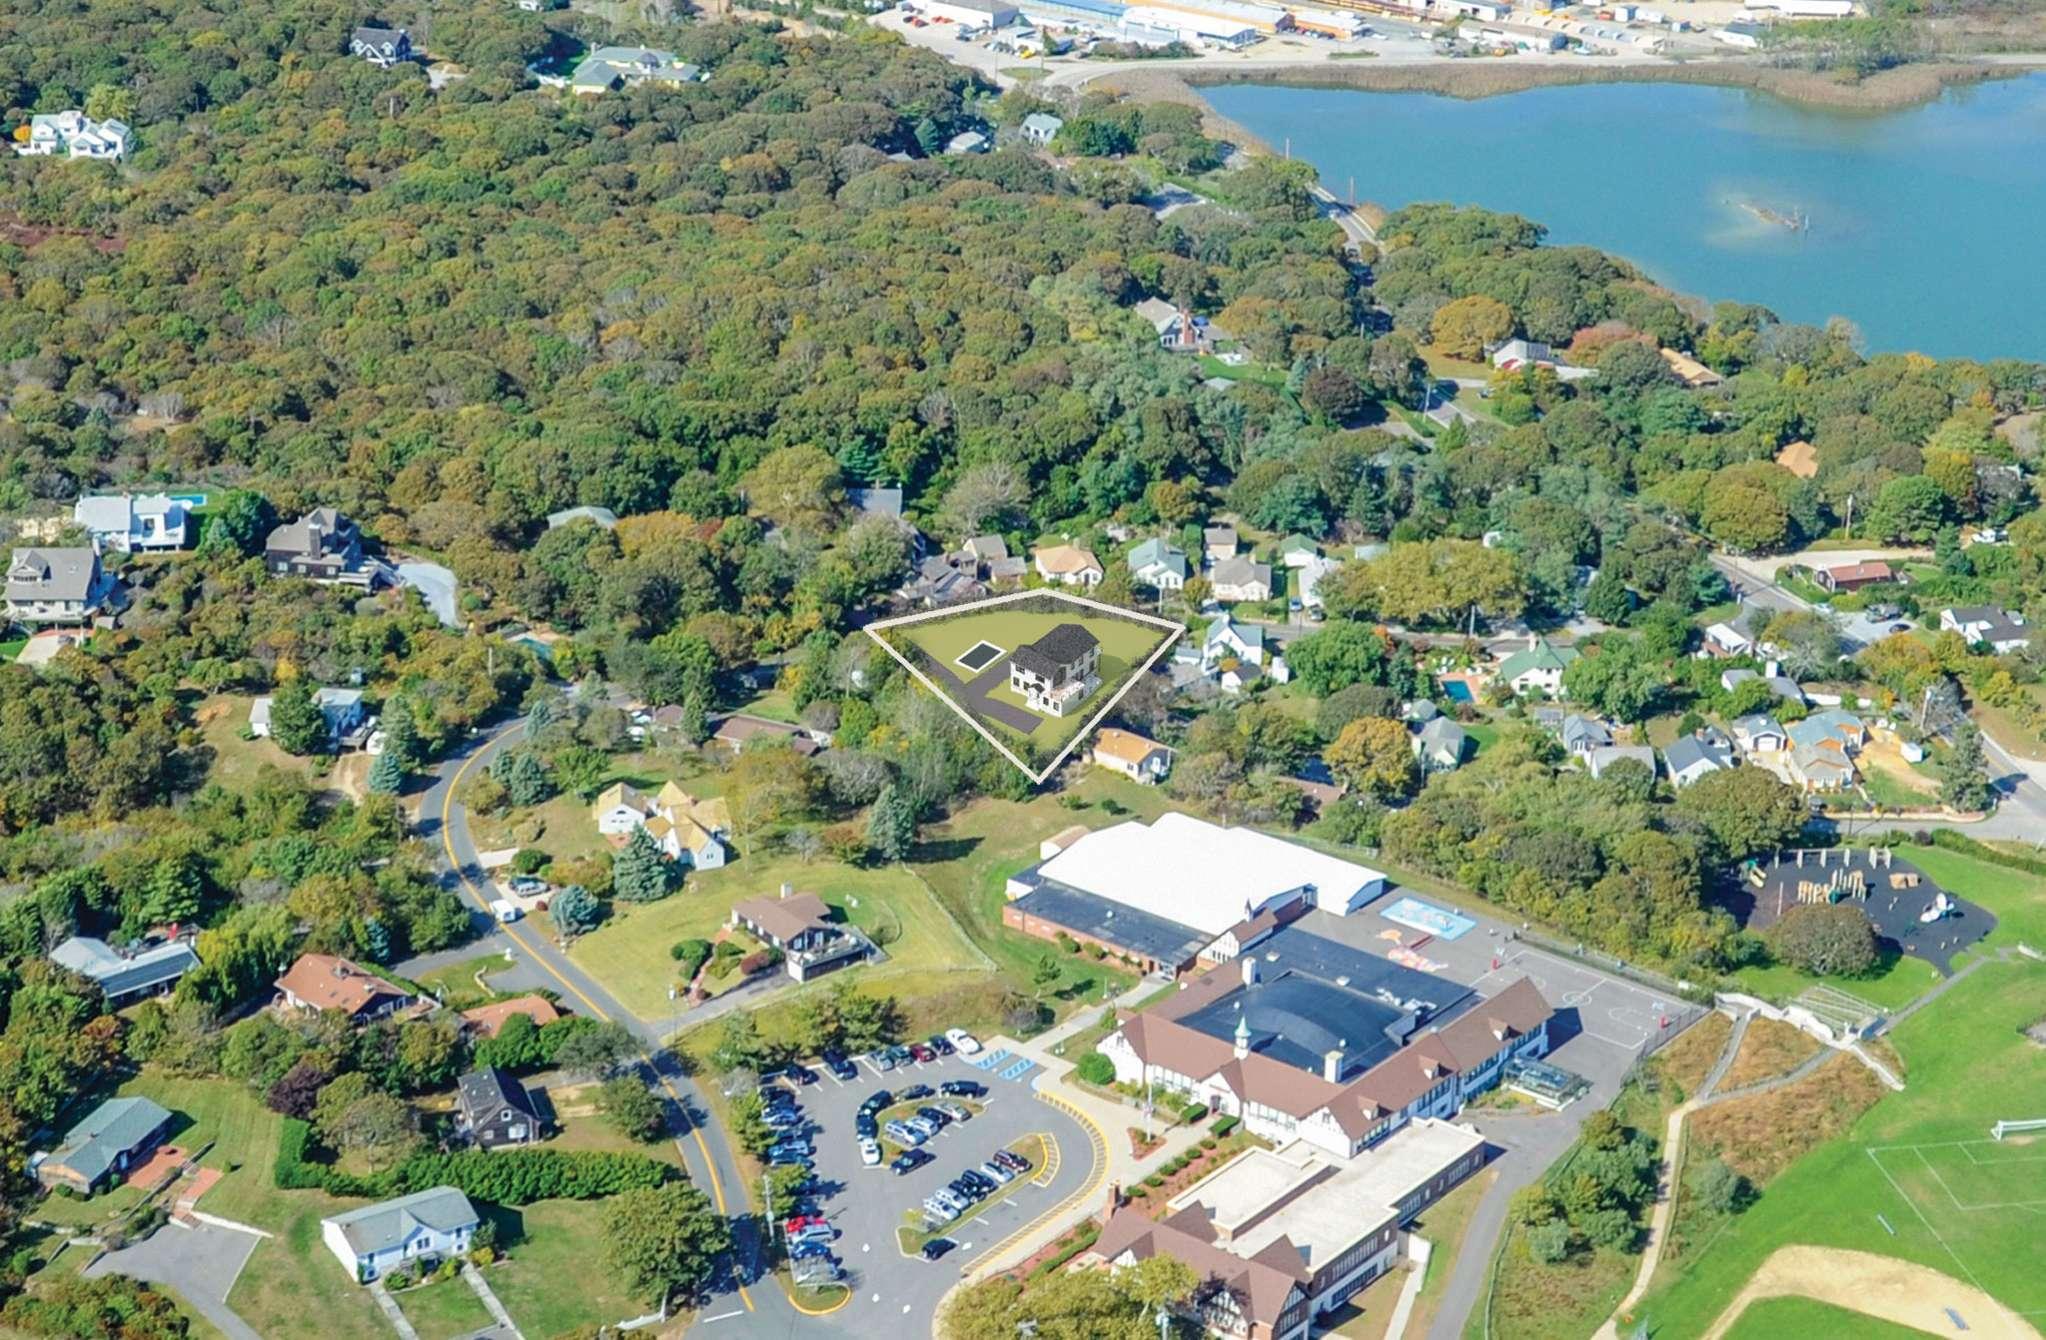 Single Family Home for Sale at Custom New Construction, Montauk Water Views 29 Dewey Place, Montauk, New York